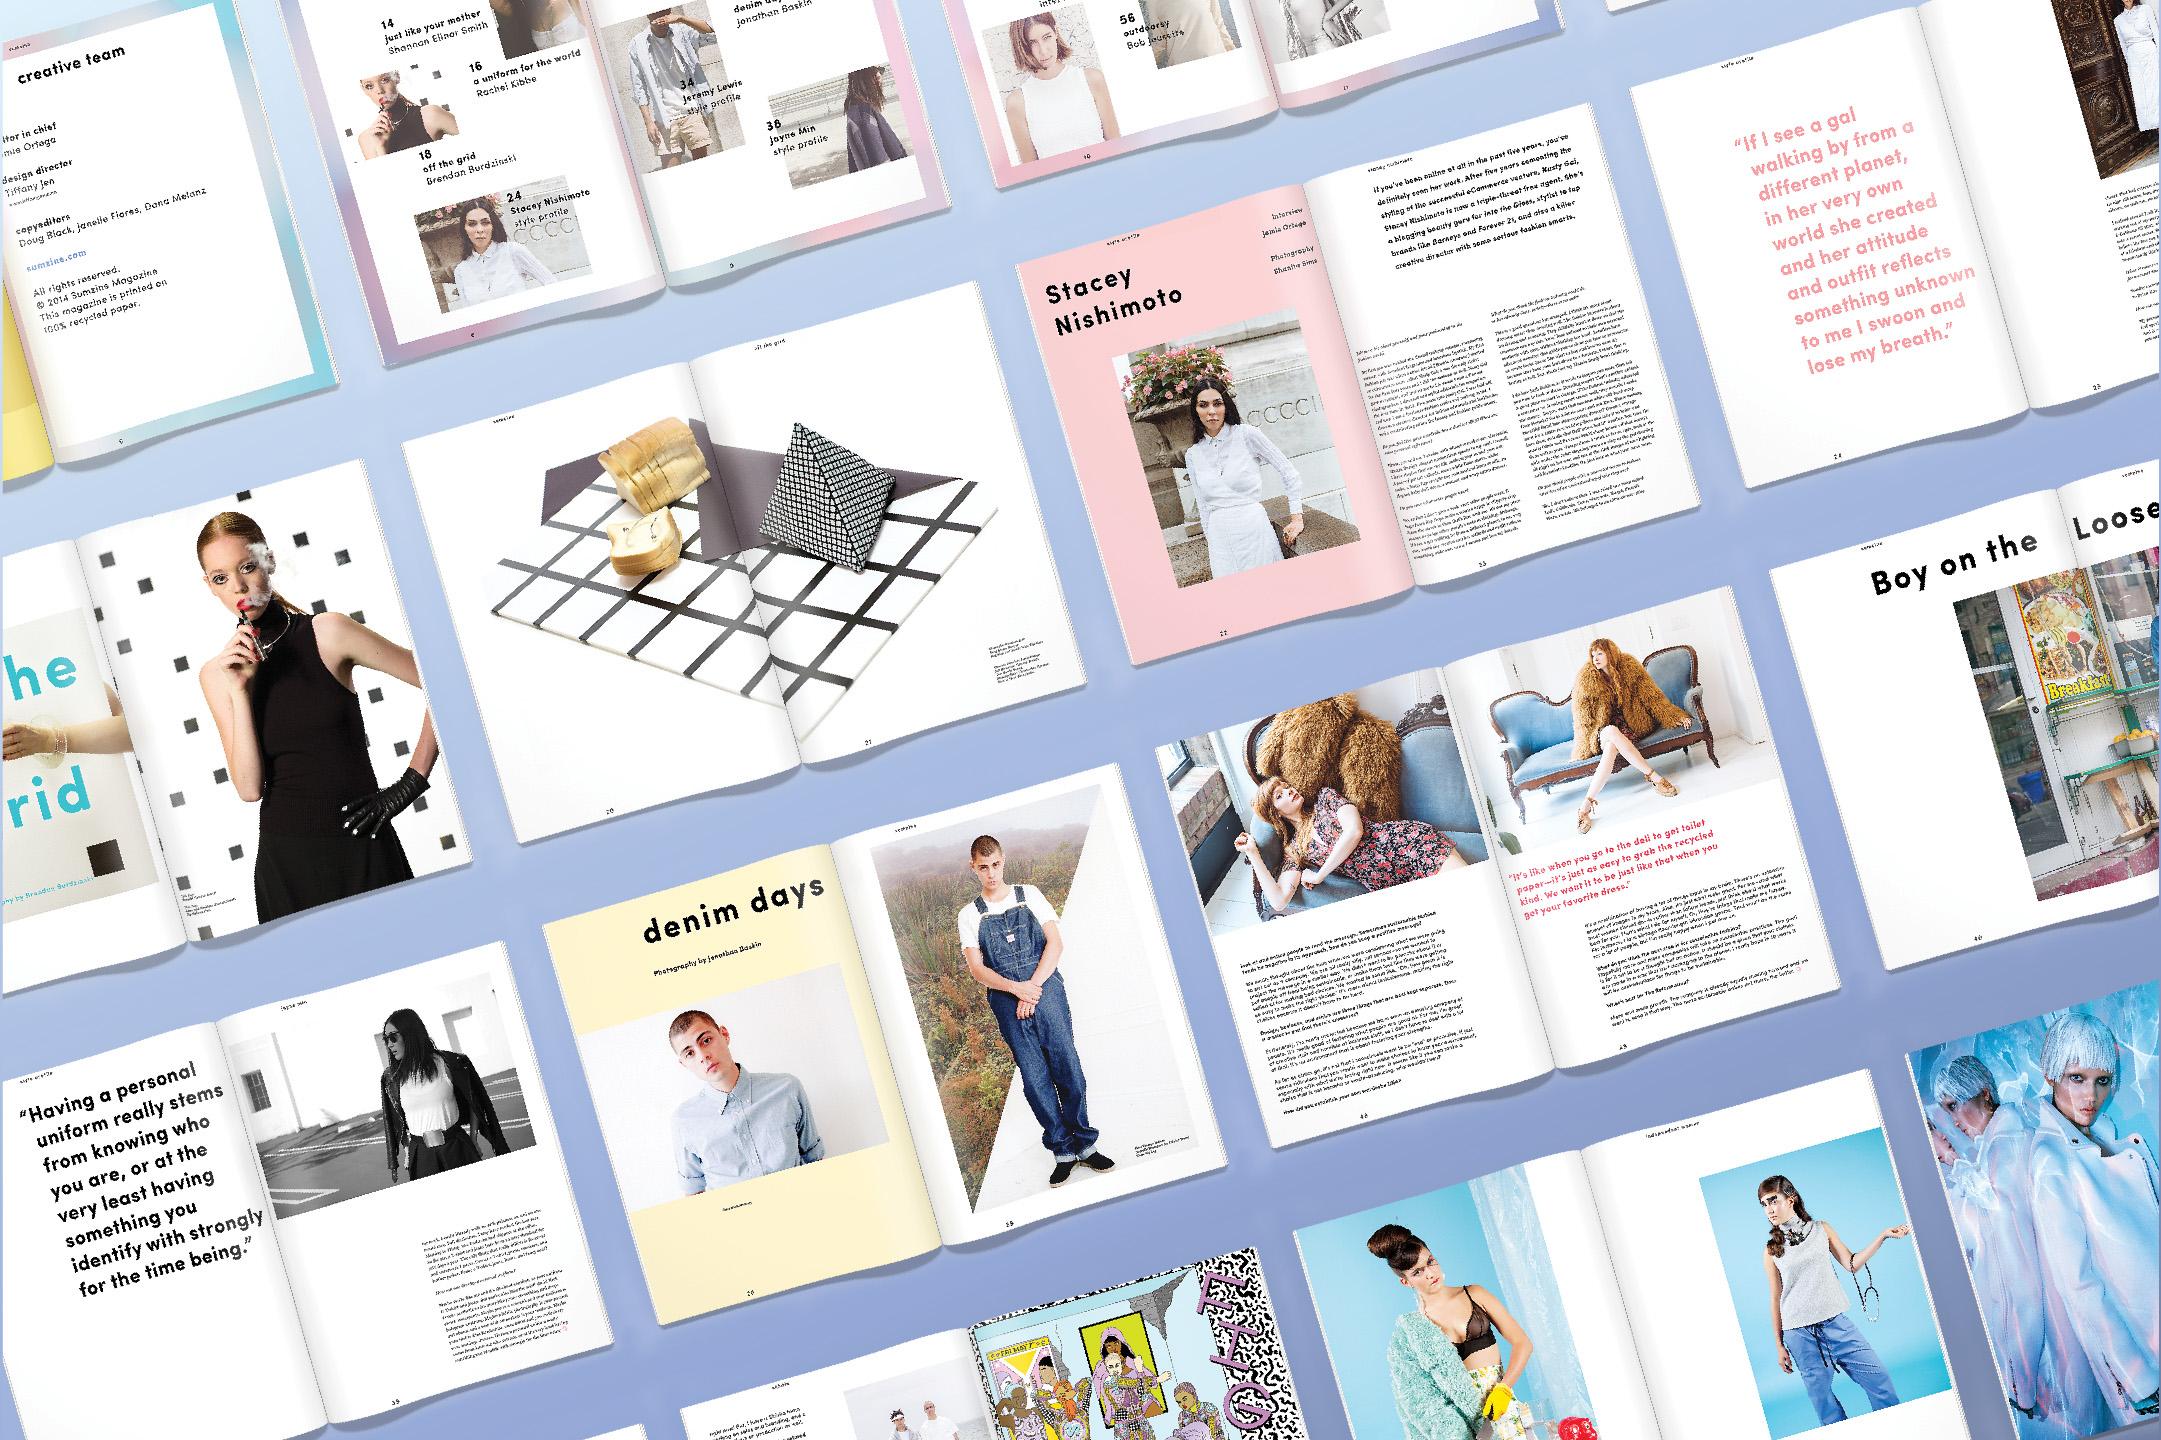 Sumzine-layouts-01.jpg